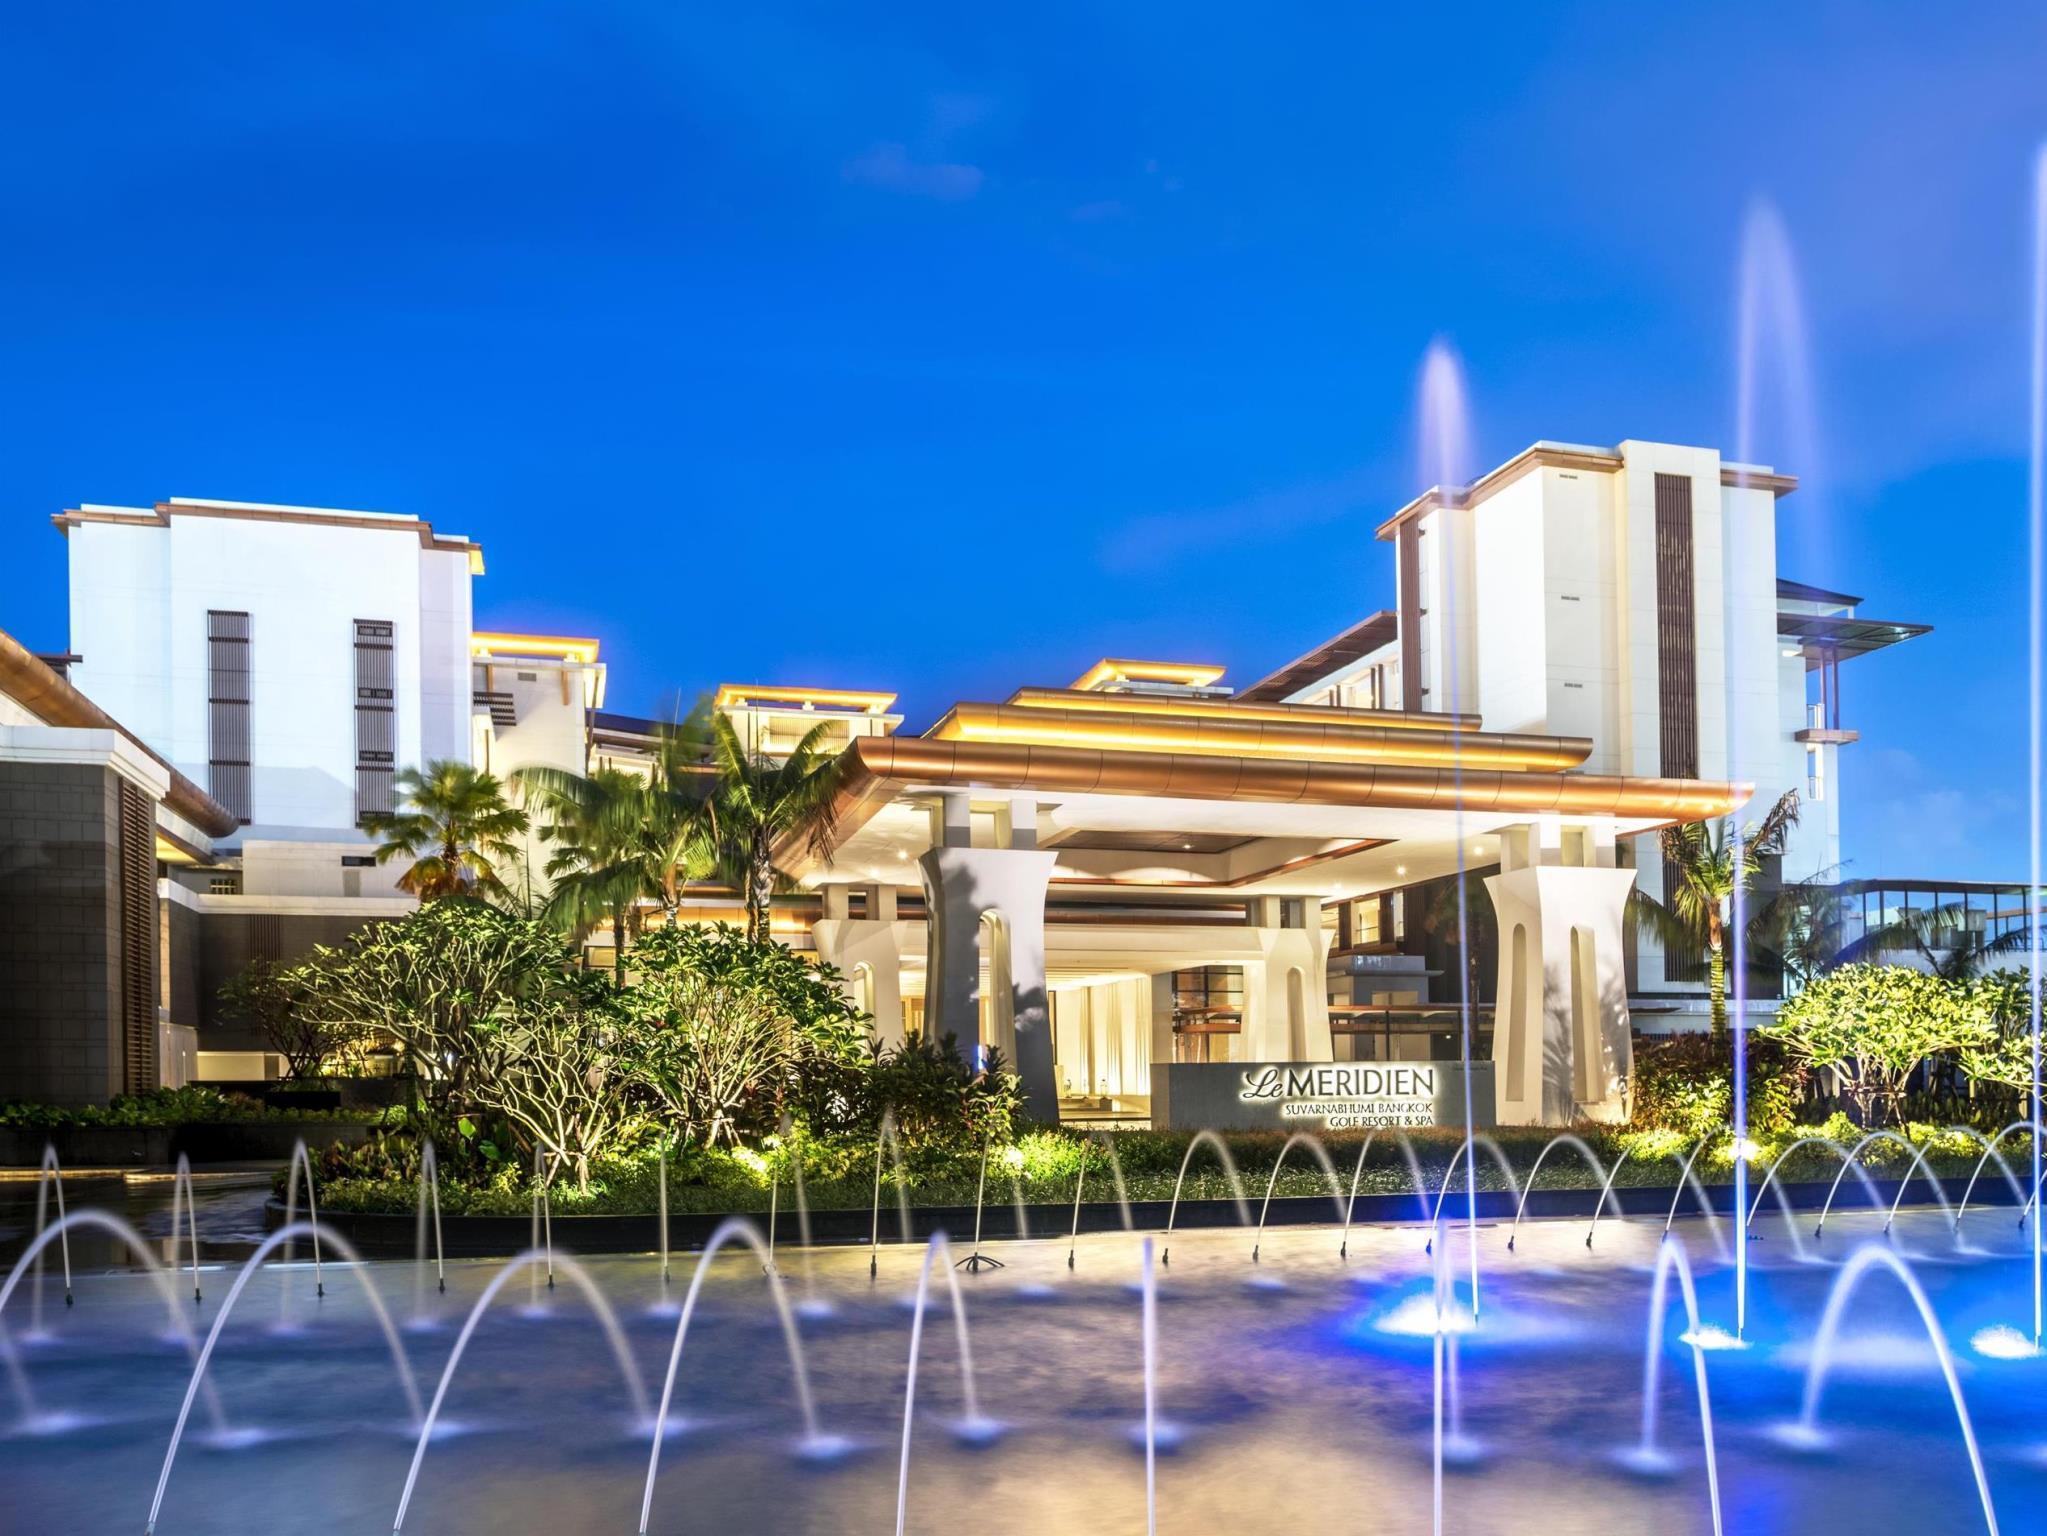 Le Meridien Suvarnabhumi Bangkok Golf Resort & Spa - Bangkok